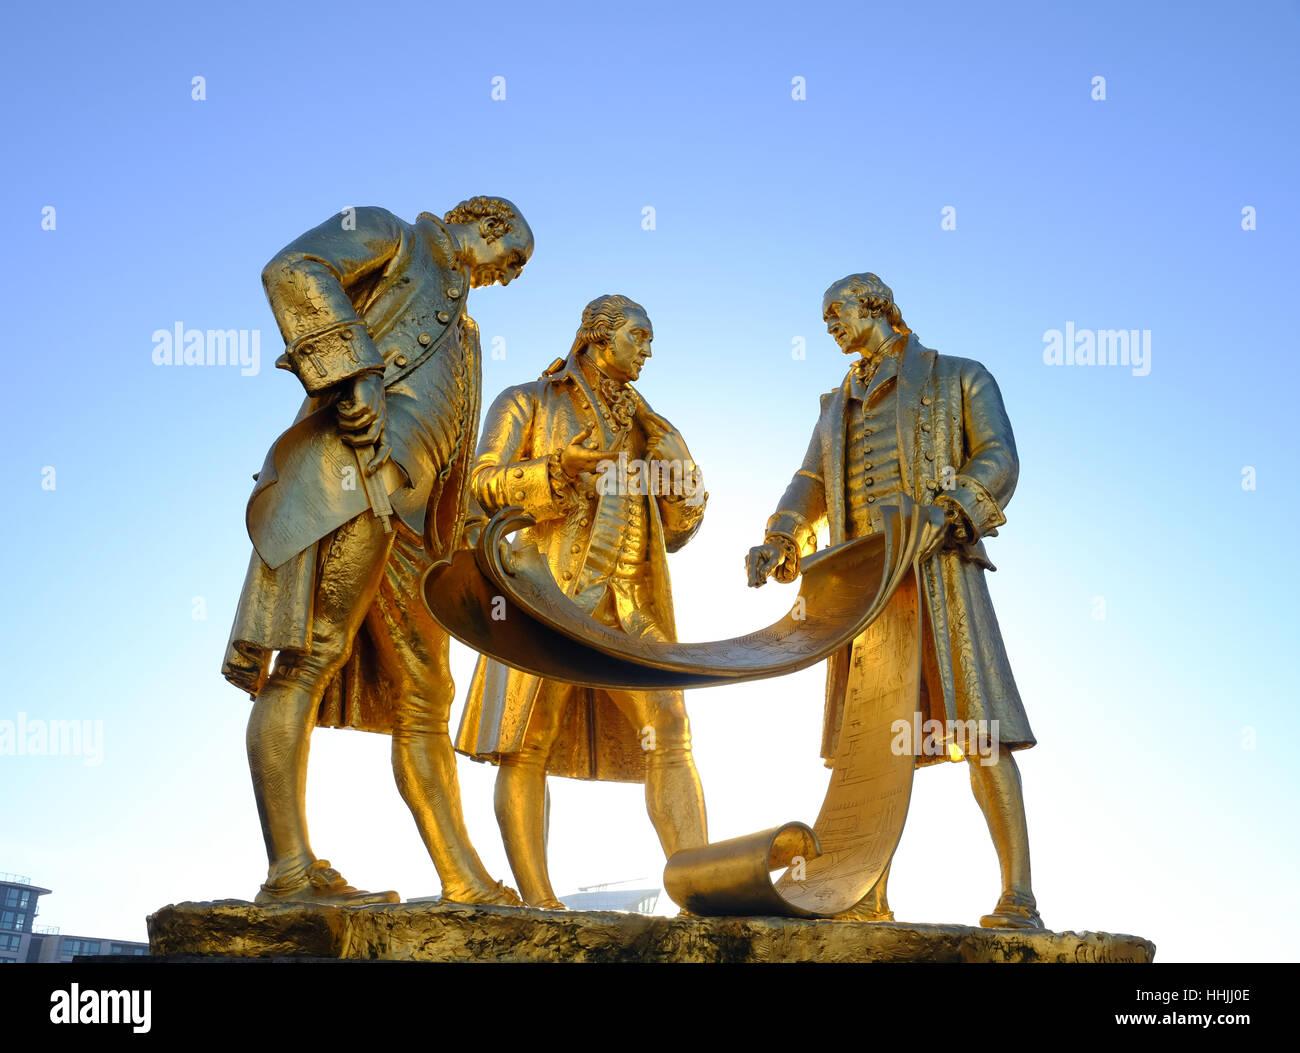 Boulton, Watt & Murdoch Statue, Broad Street, Birmingham - Stock Image